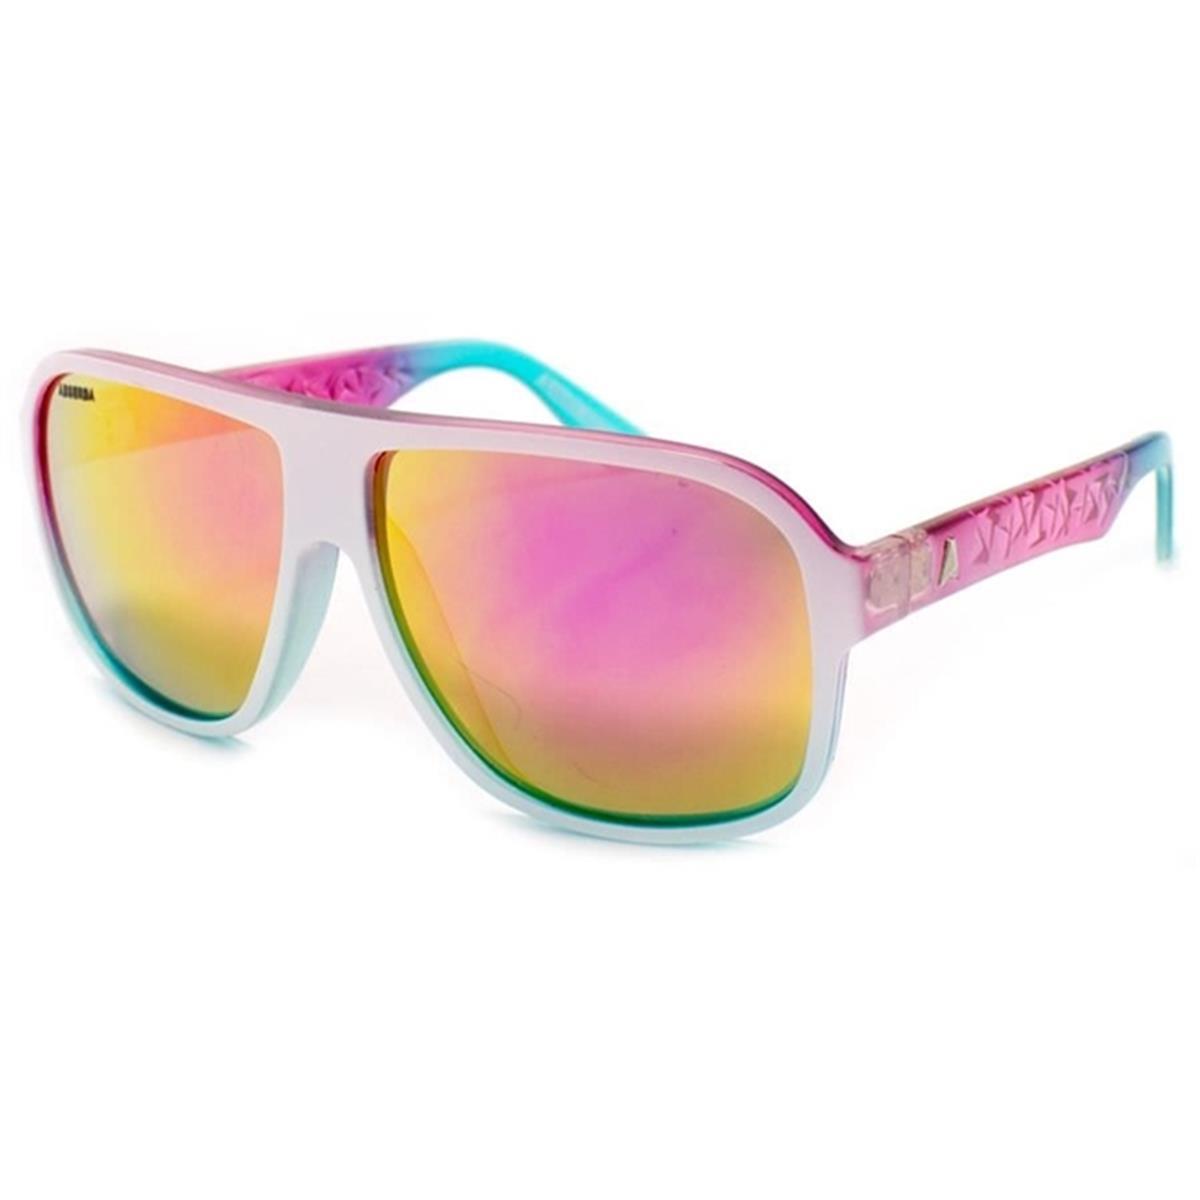 Óculos de Sol Branco Rosa Lente Espelhada CALIXTO Absurda 10bcf1f4f6